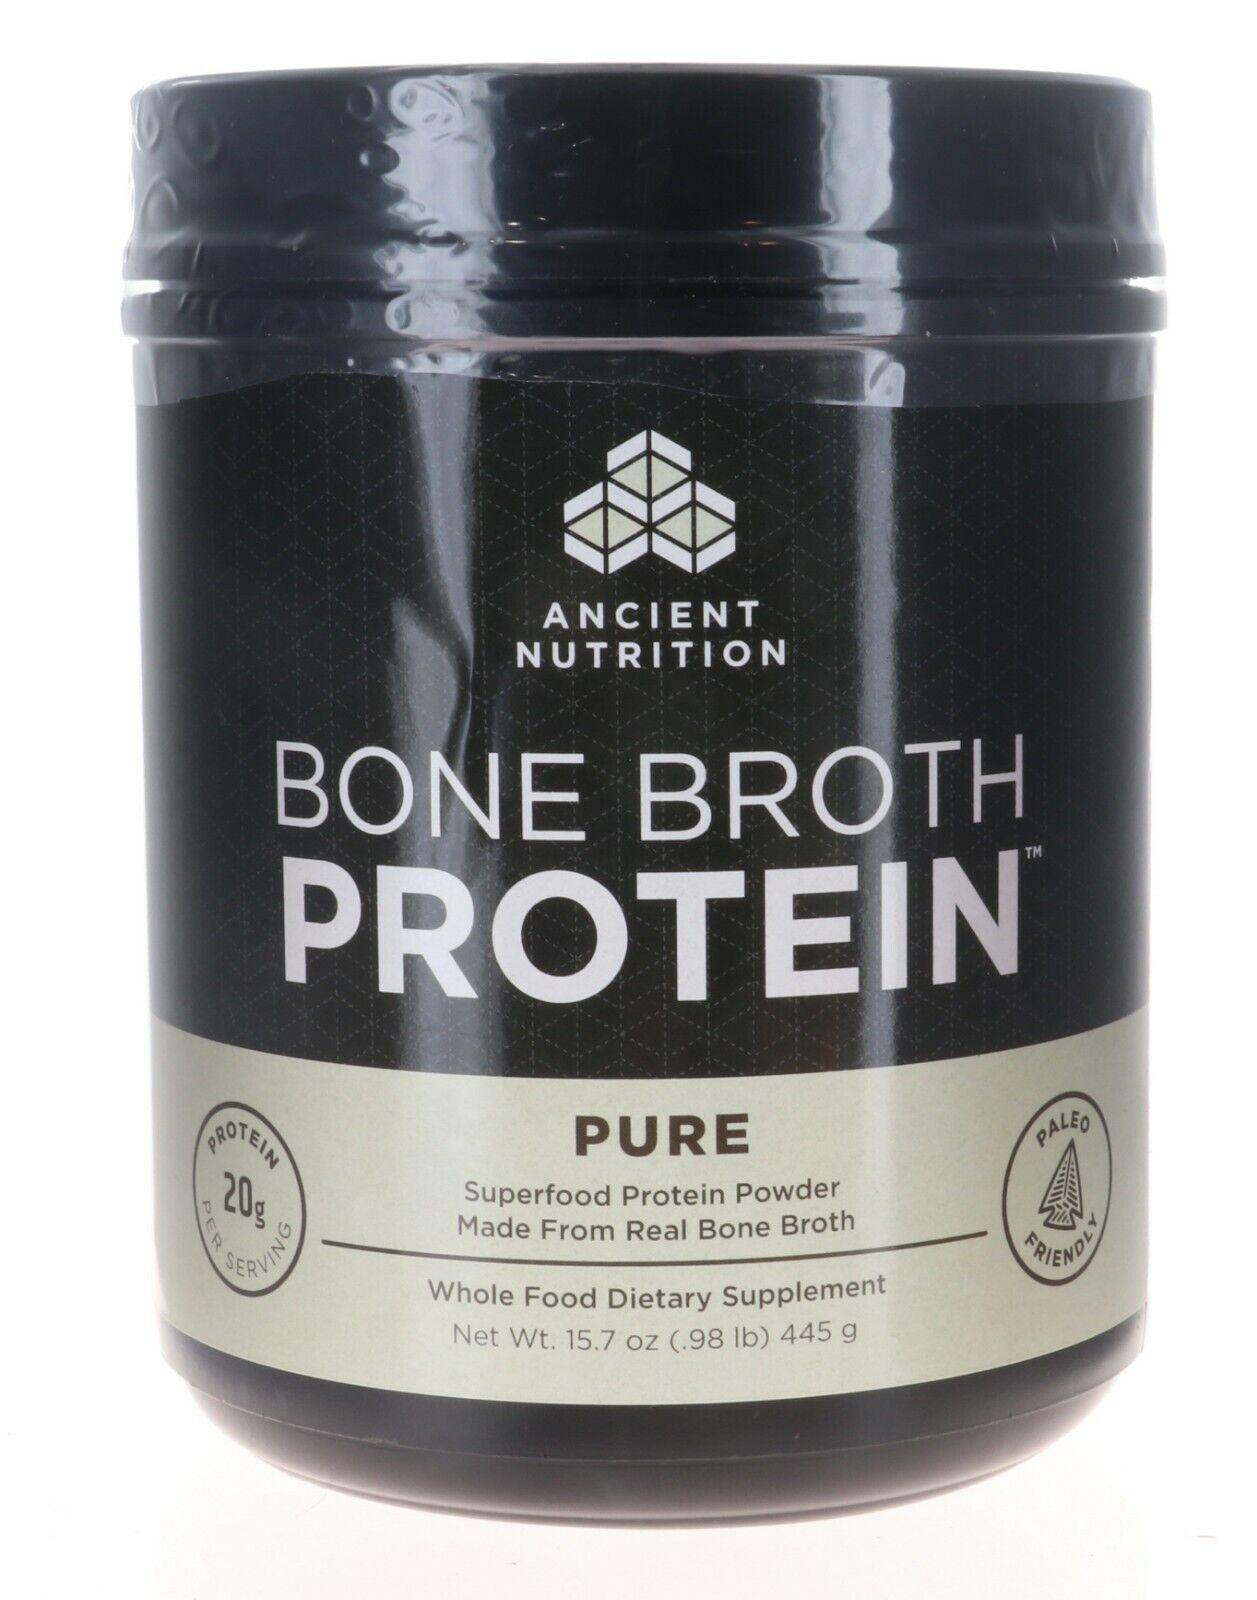 Ancient Nutrition Bone Broth Protein Powder Bundle Pack - Pu